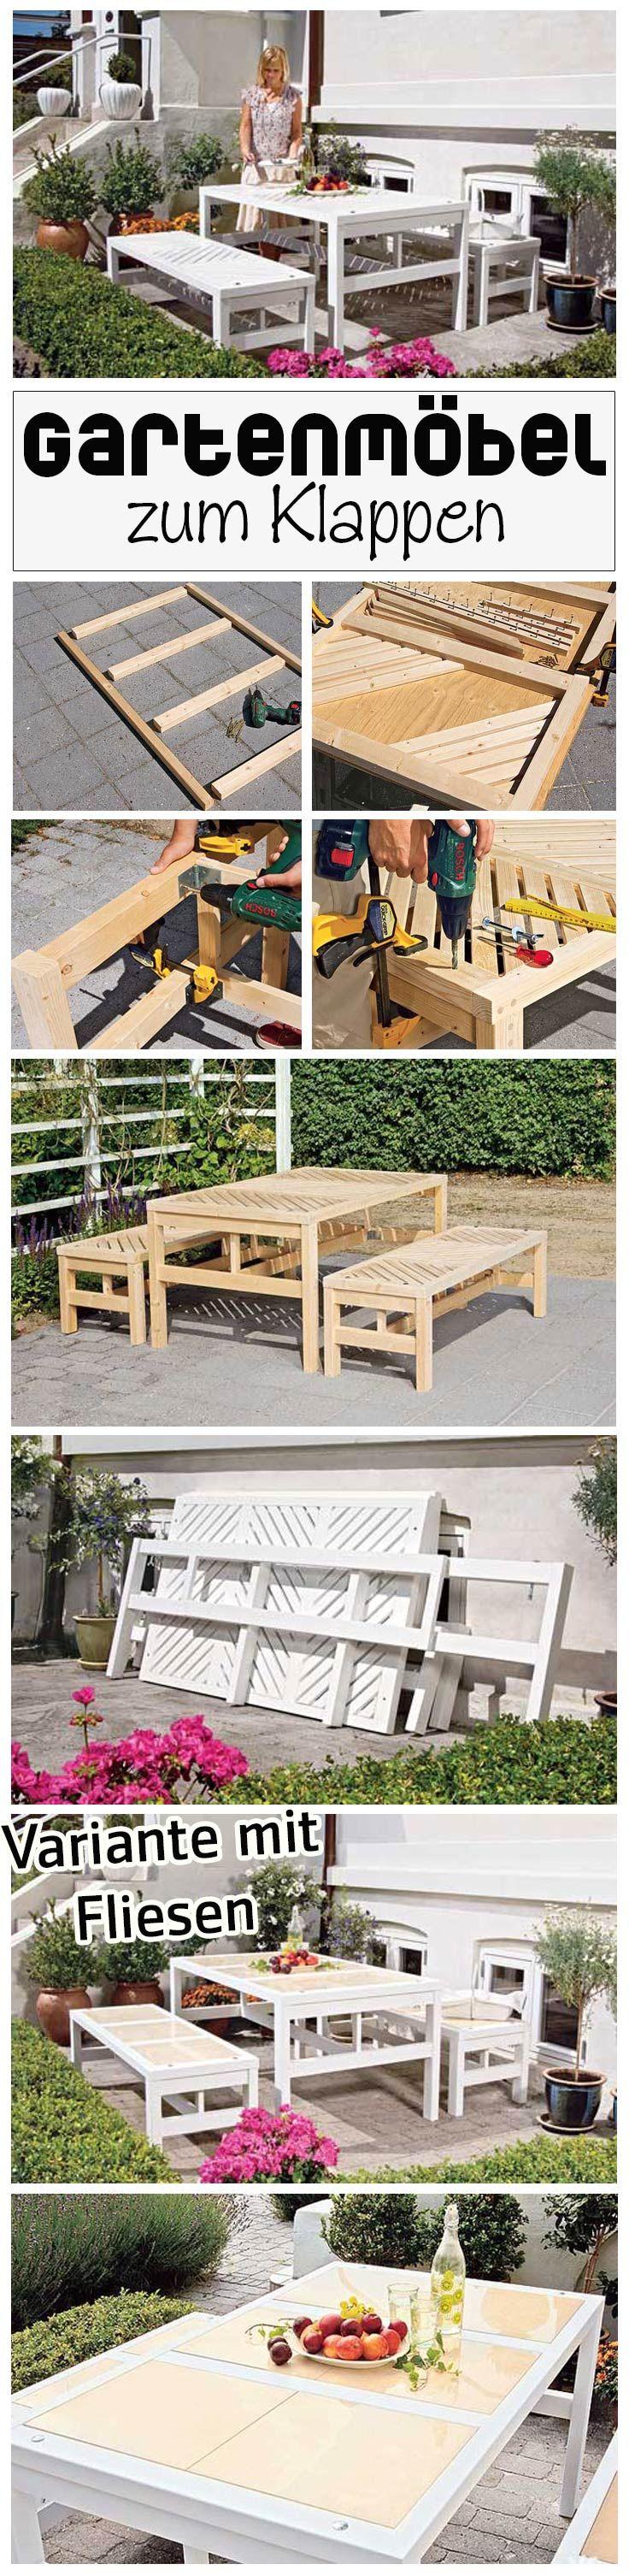 gartenm bel zum klappen gardens garten and outdoor ideas. Black Bedroom Furniture Sets. Home Design Ideas